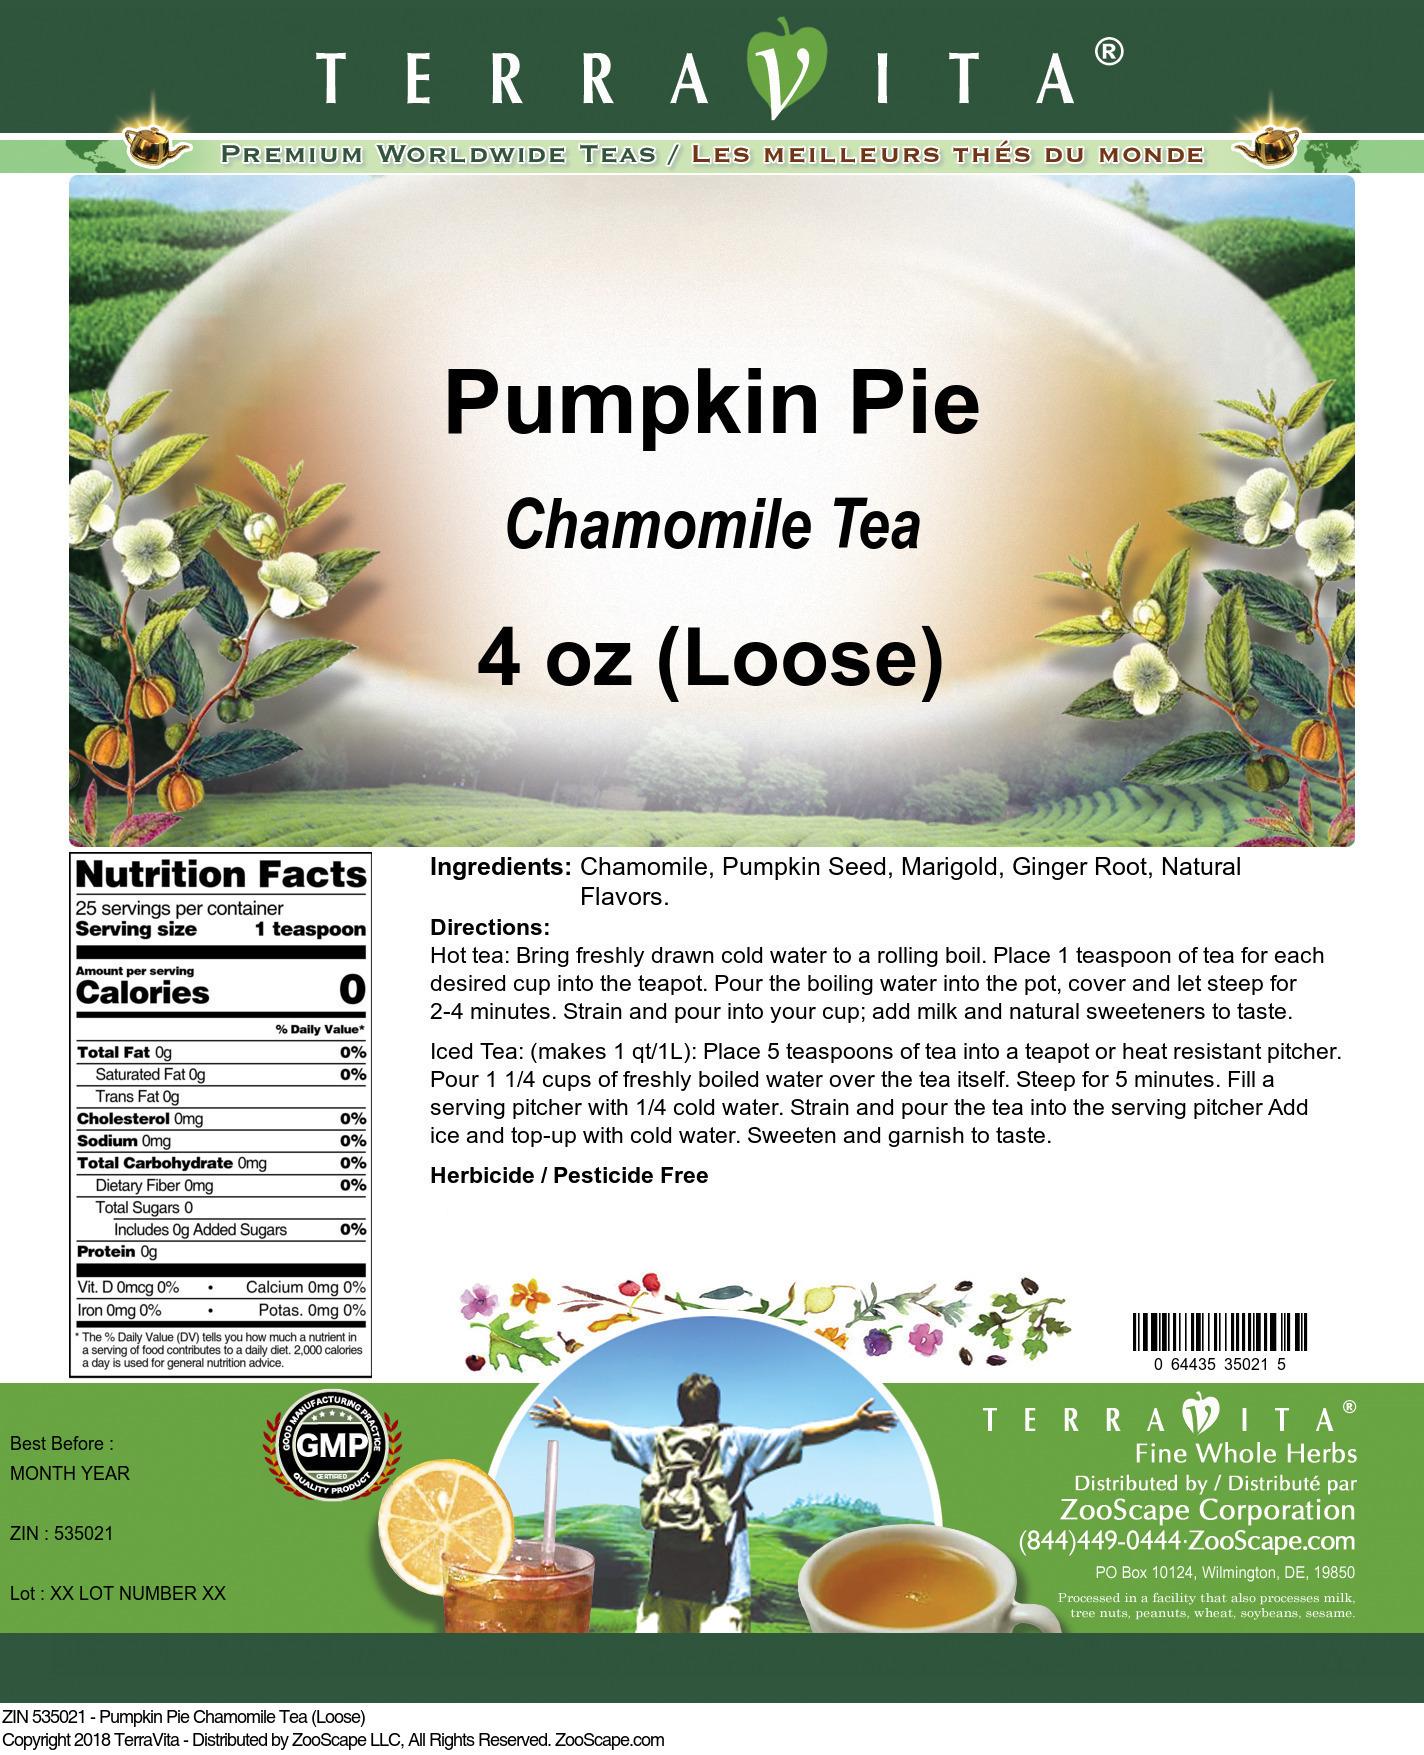 Pumpkin Pie Chamomile Tea (Loose)